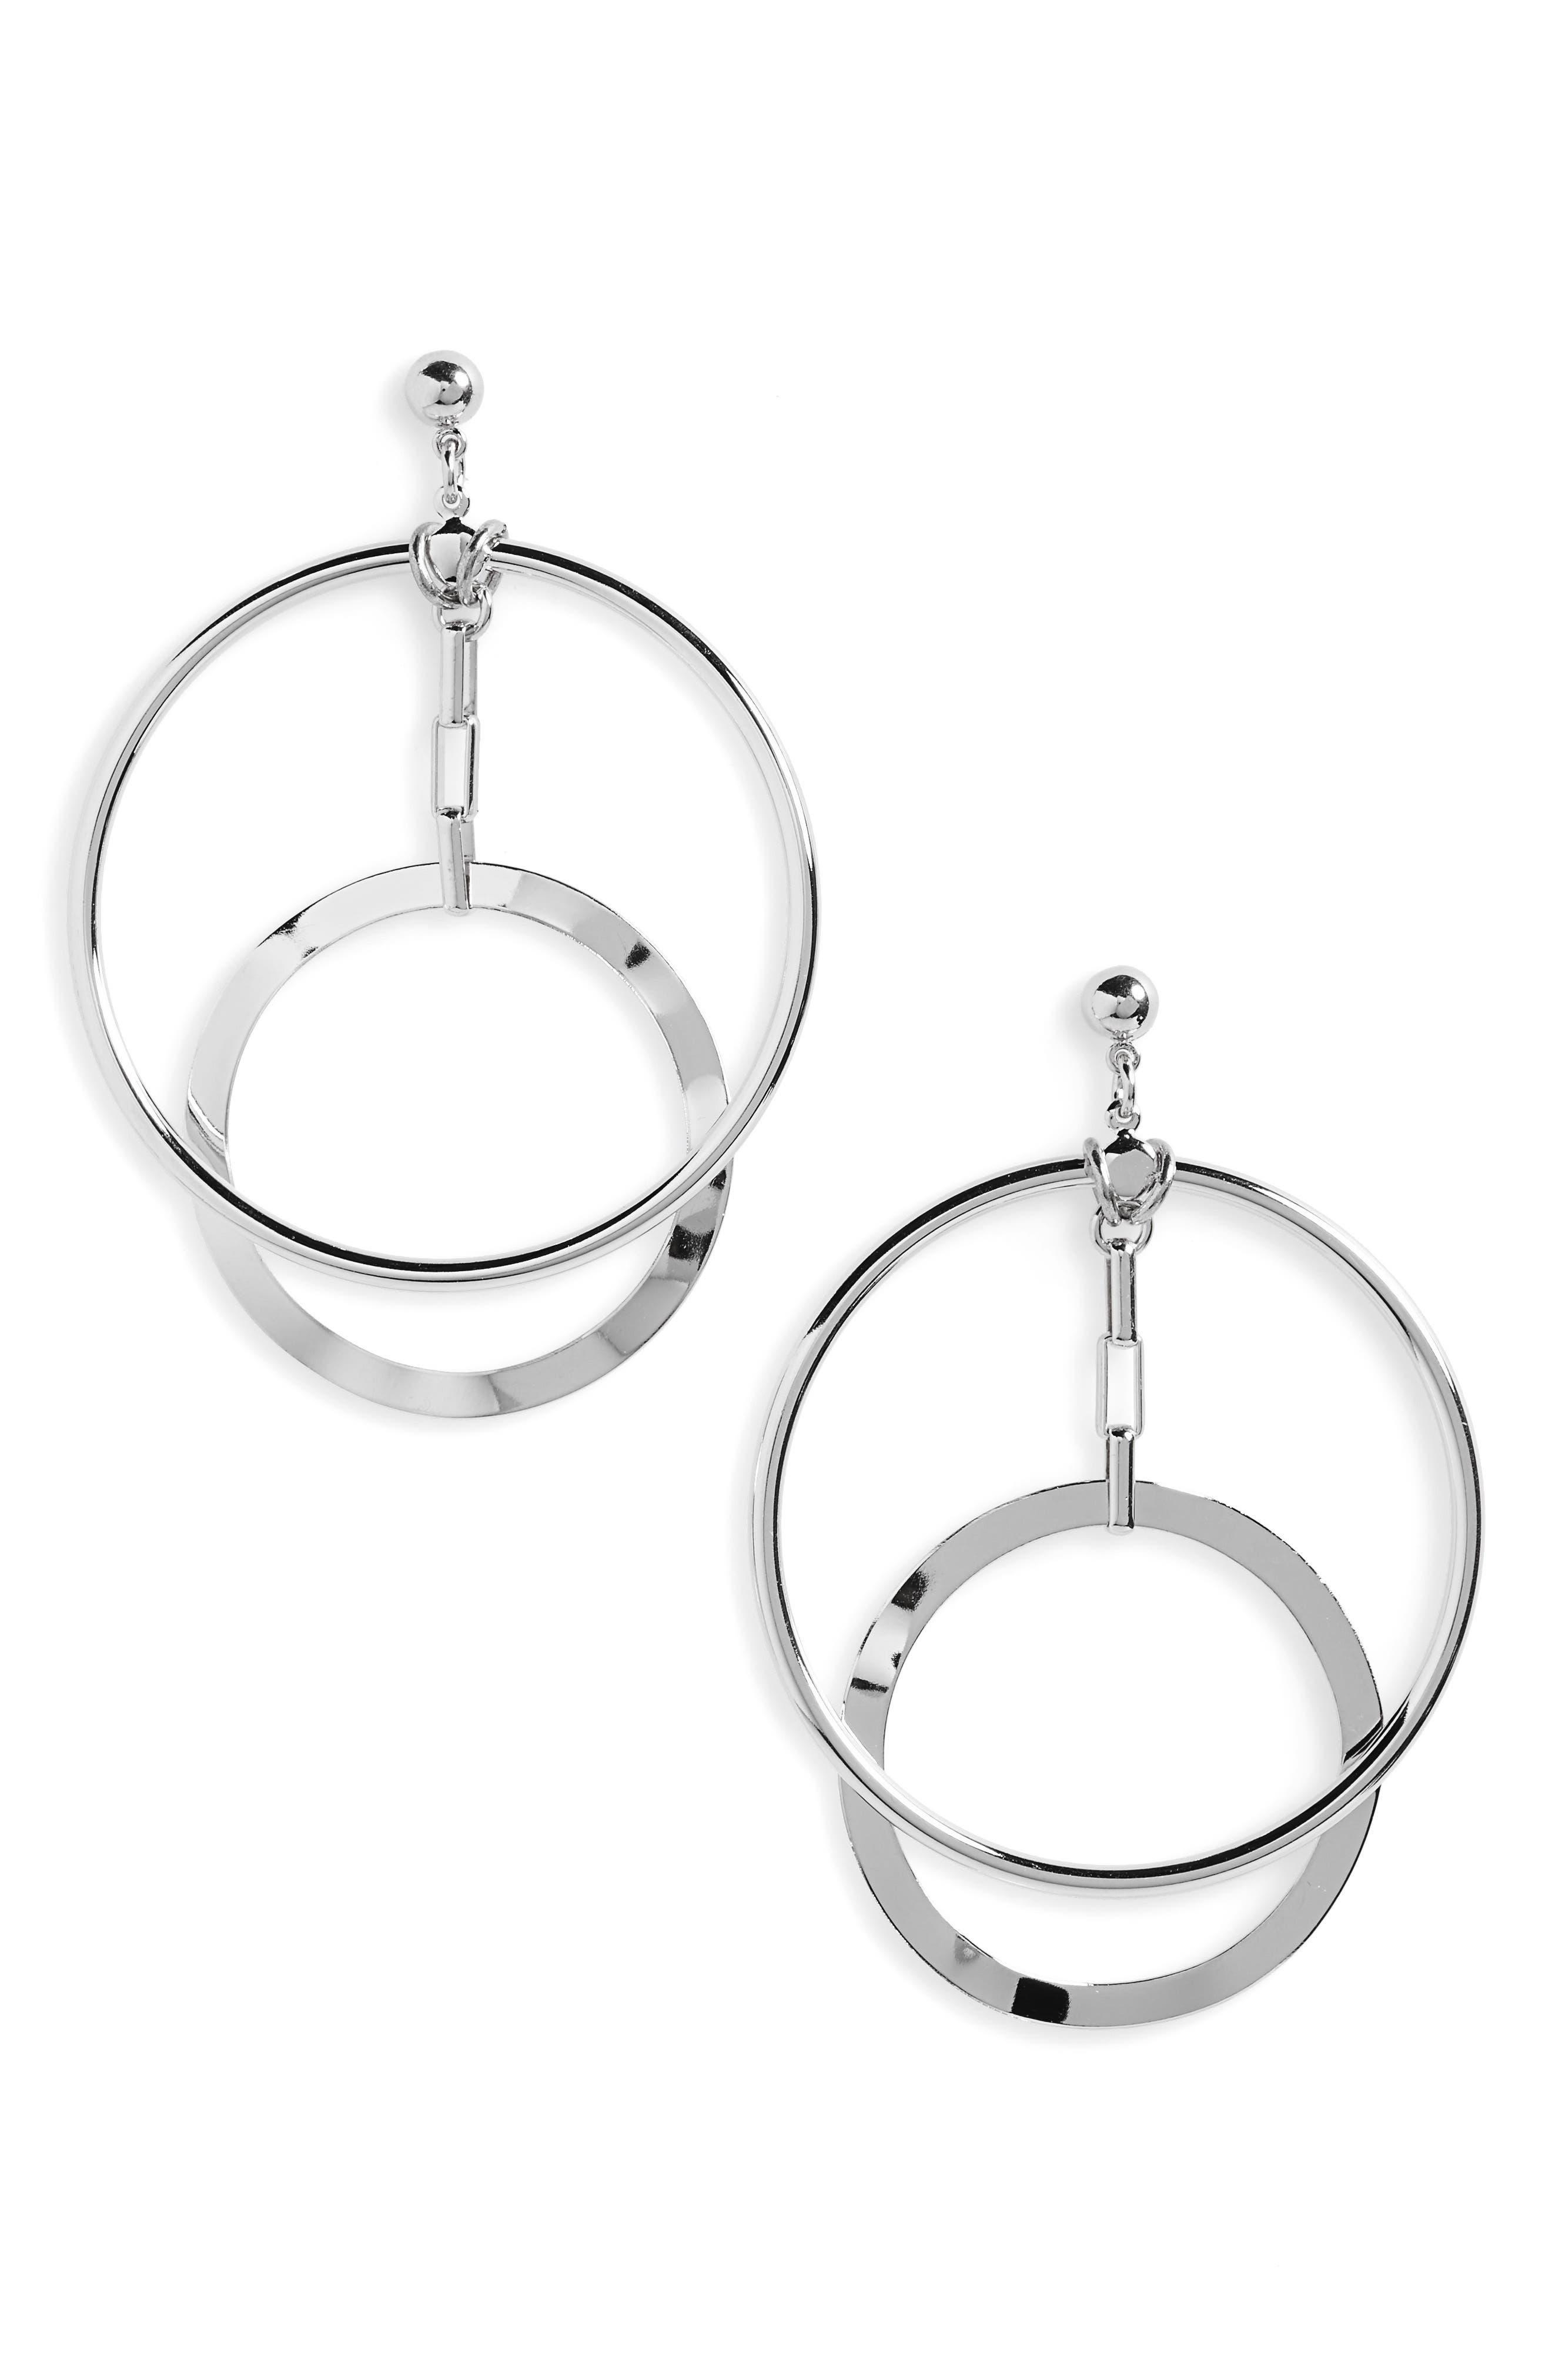 Eclipse Hoop Earrings,                             Main thumbnail 1, color,                             Silver